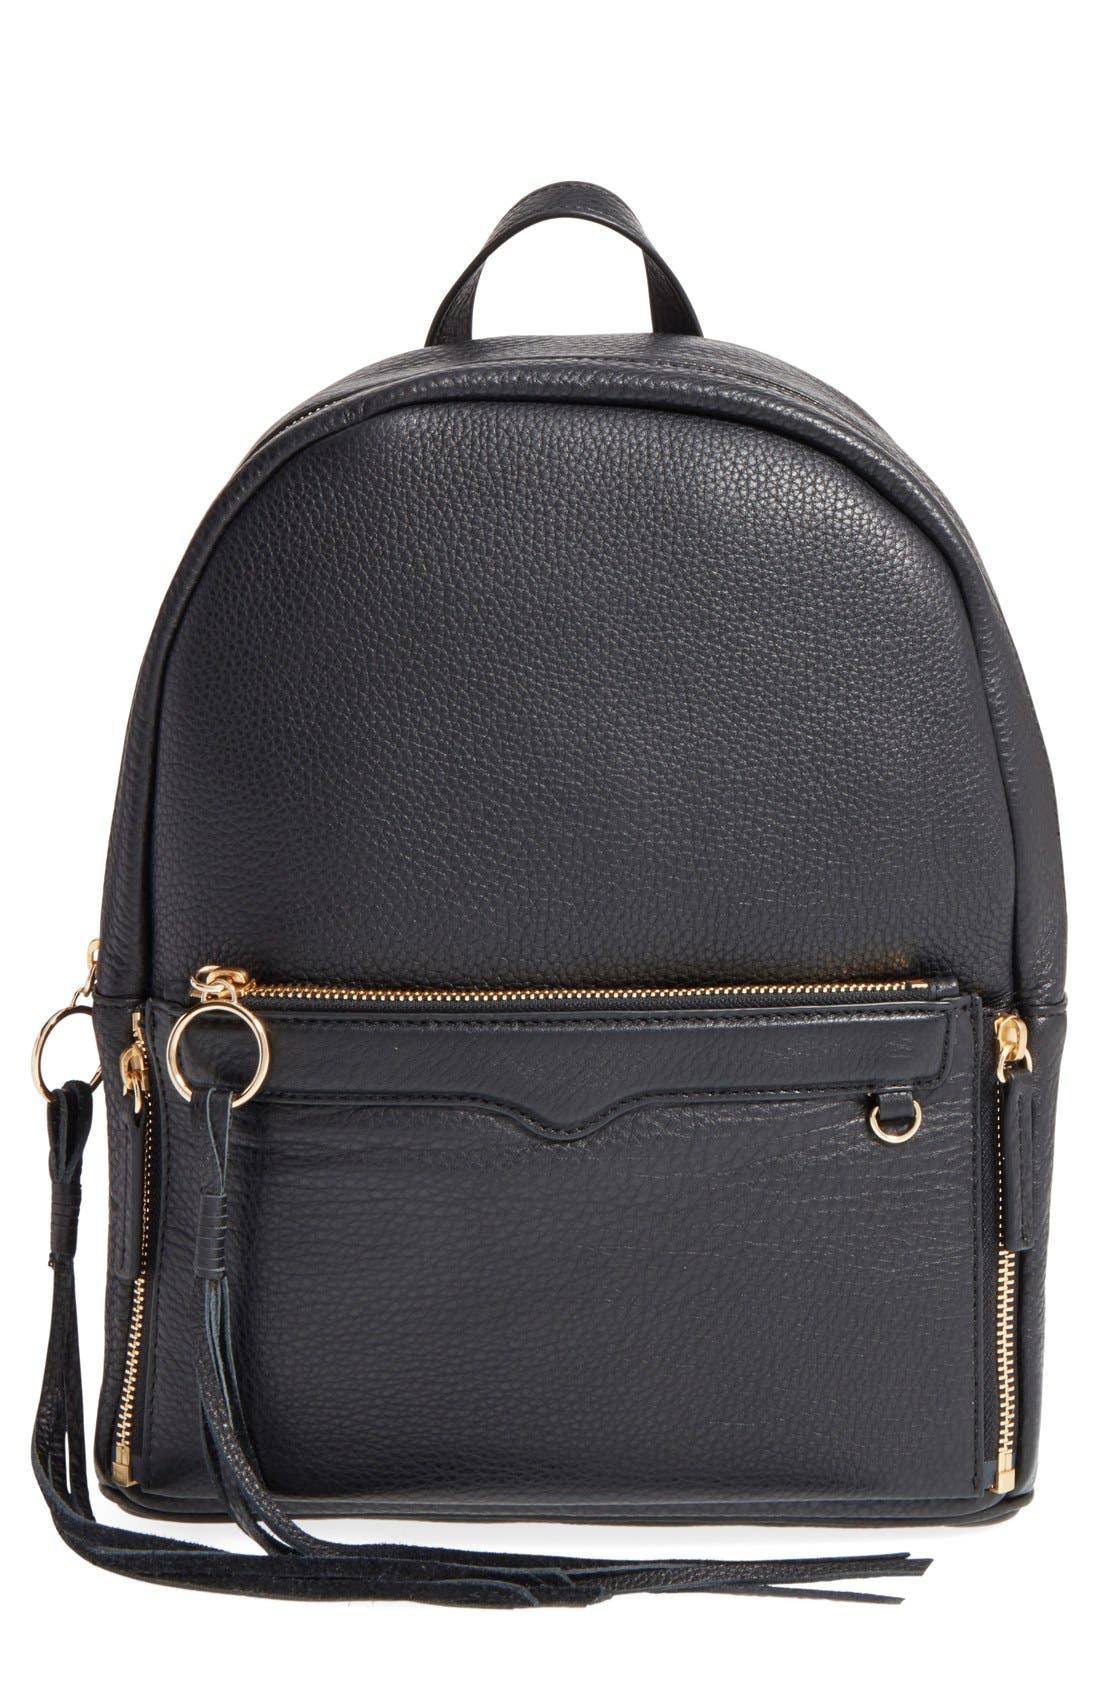 Main Image - Rebecca Minkoff 'Lola' Backpack with Detachable Crossbody